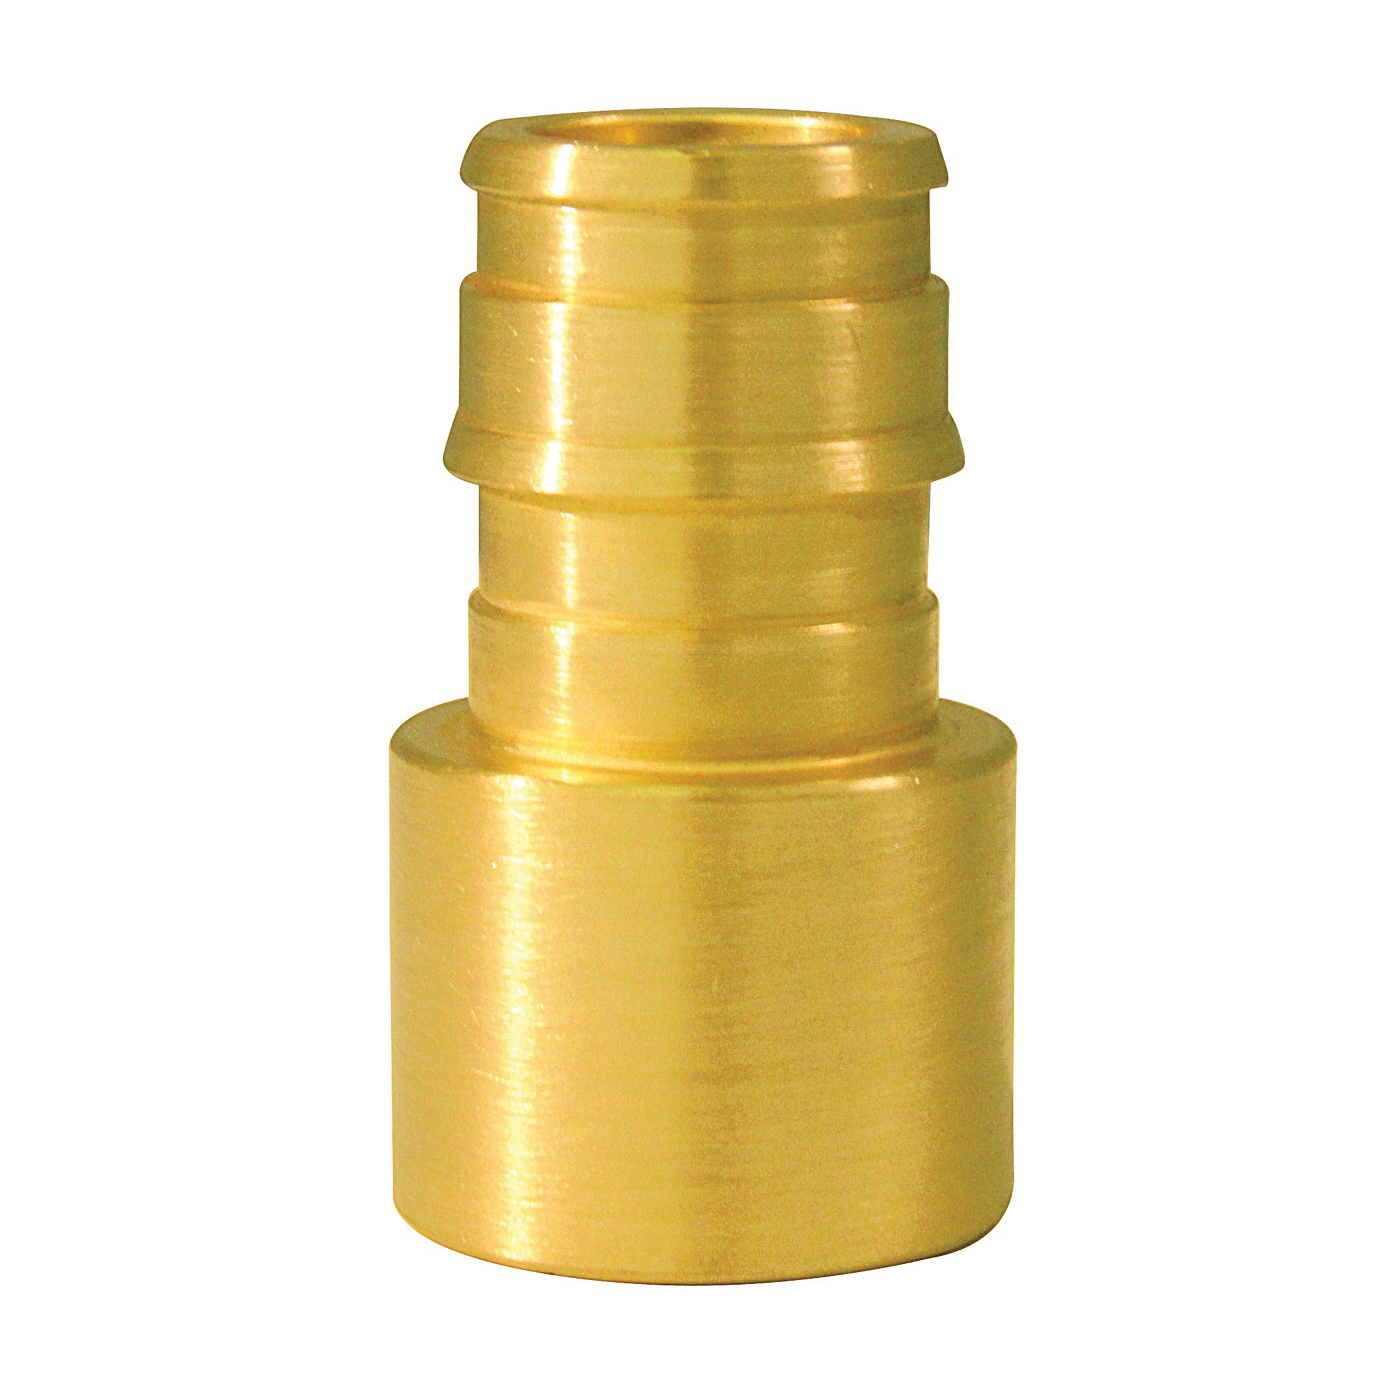 Picture of Apollo ExpansionPEX EPXFS1210PK Solder Adapter, 1/2 in, Barb x Female Sweat, Brass, 200 psi Pressure